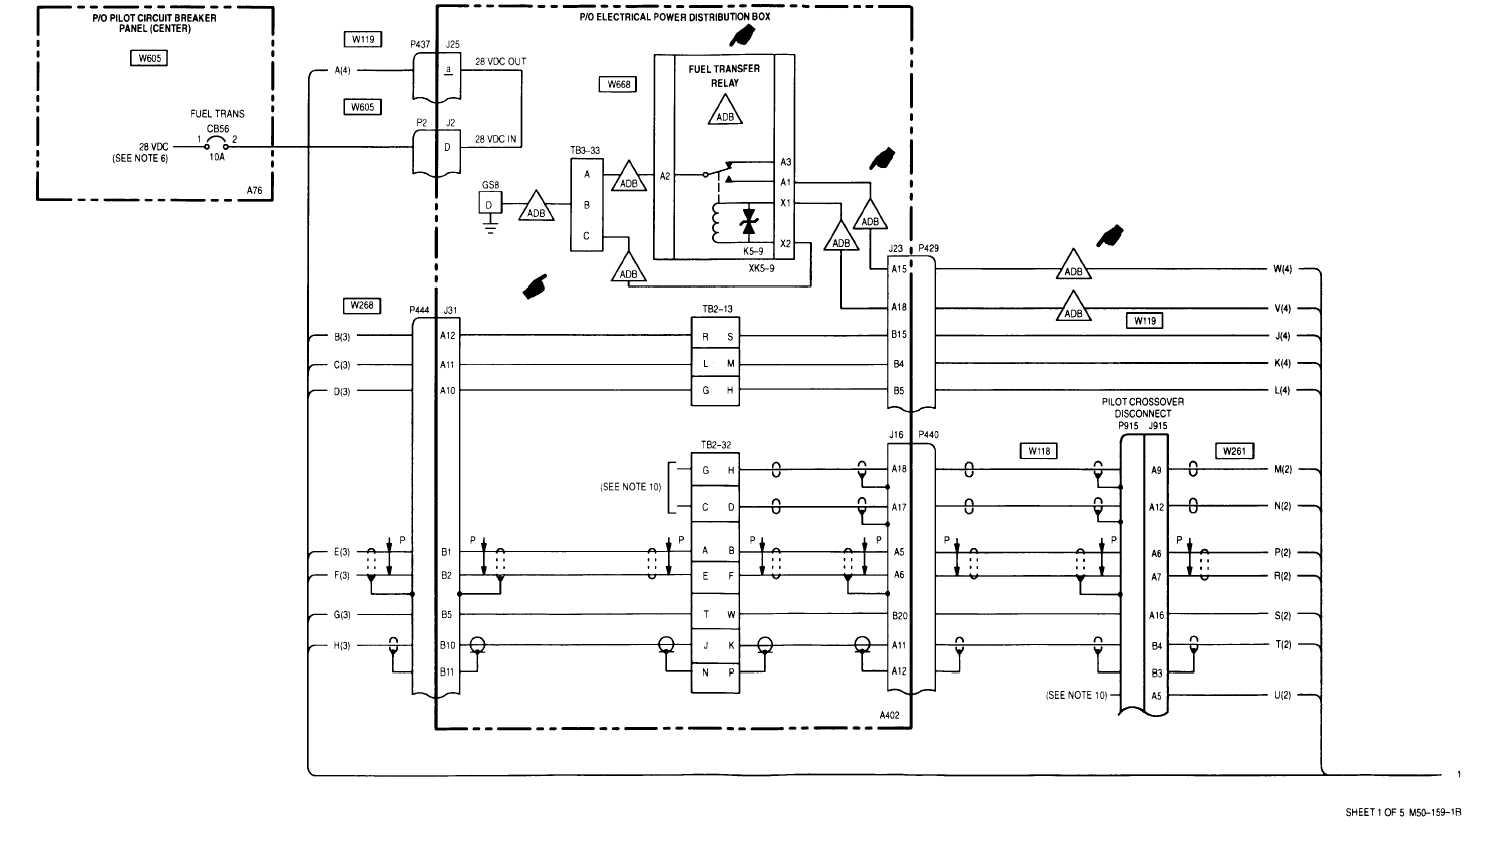 13 3 Fuel Quantity Lndication Transfer